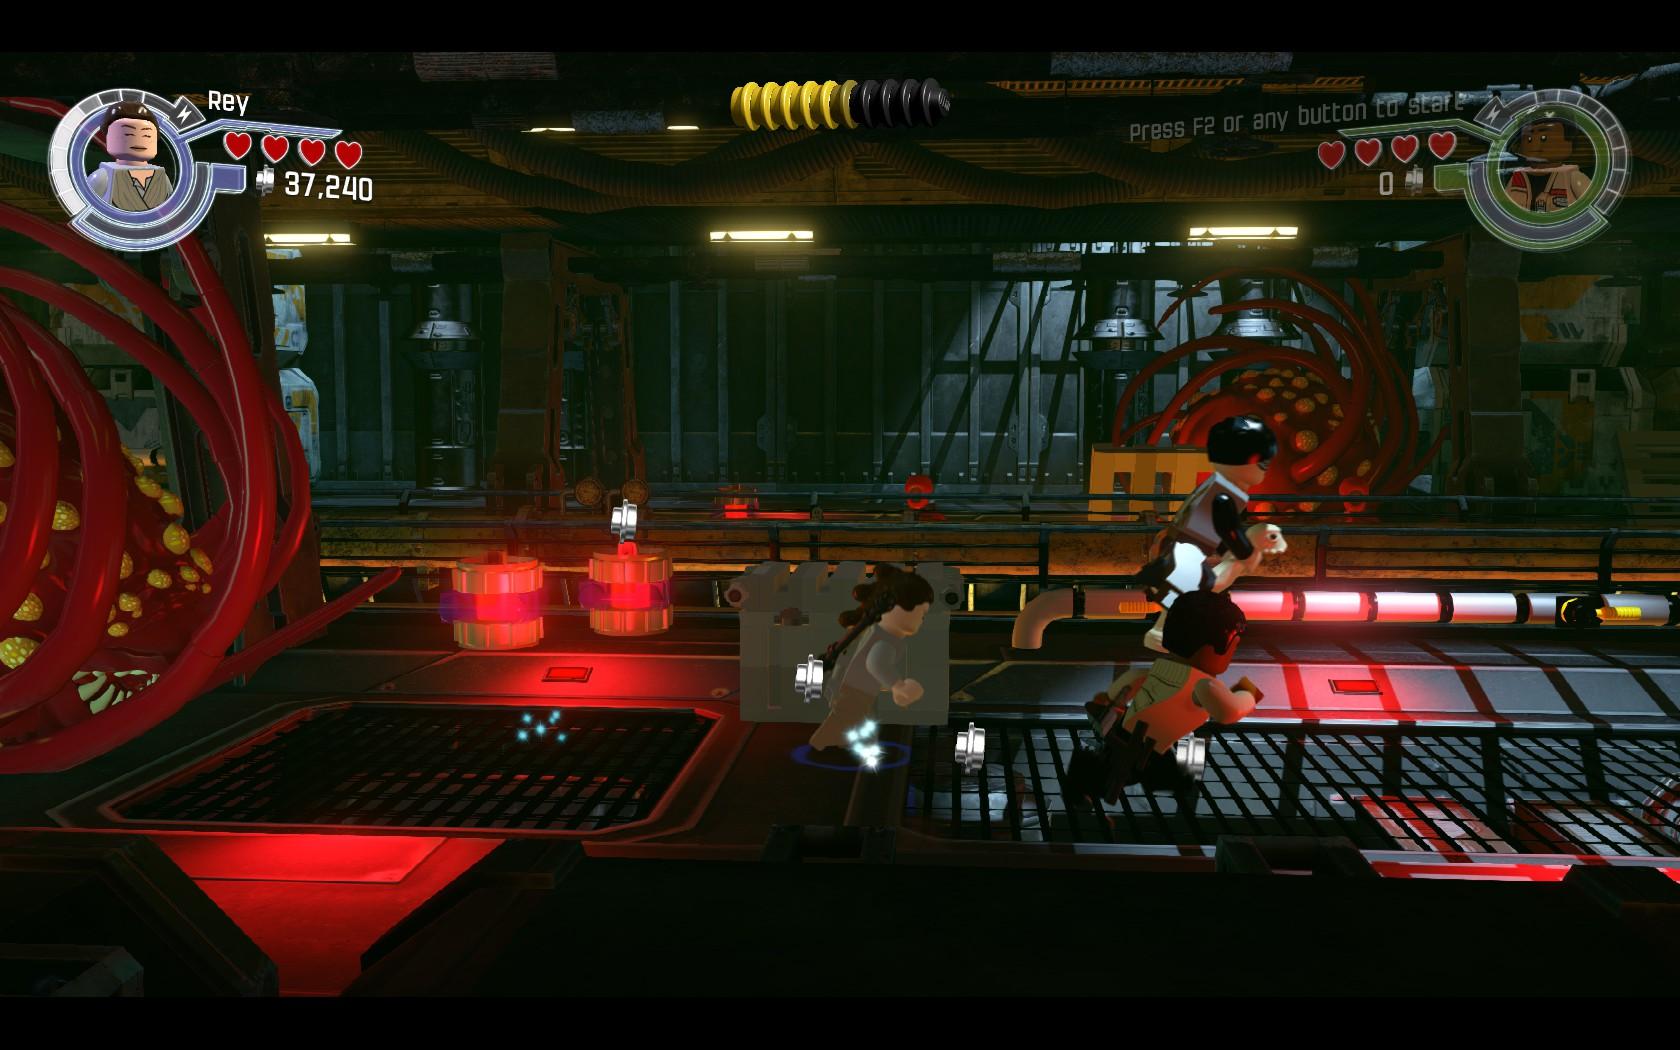 LEGO Star Wars: The Force Awakens - kostky se probouzí 126757